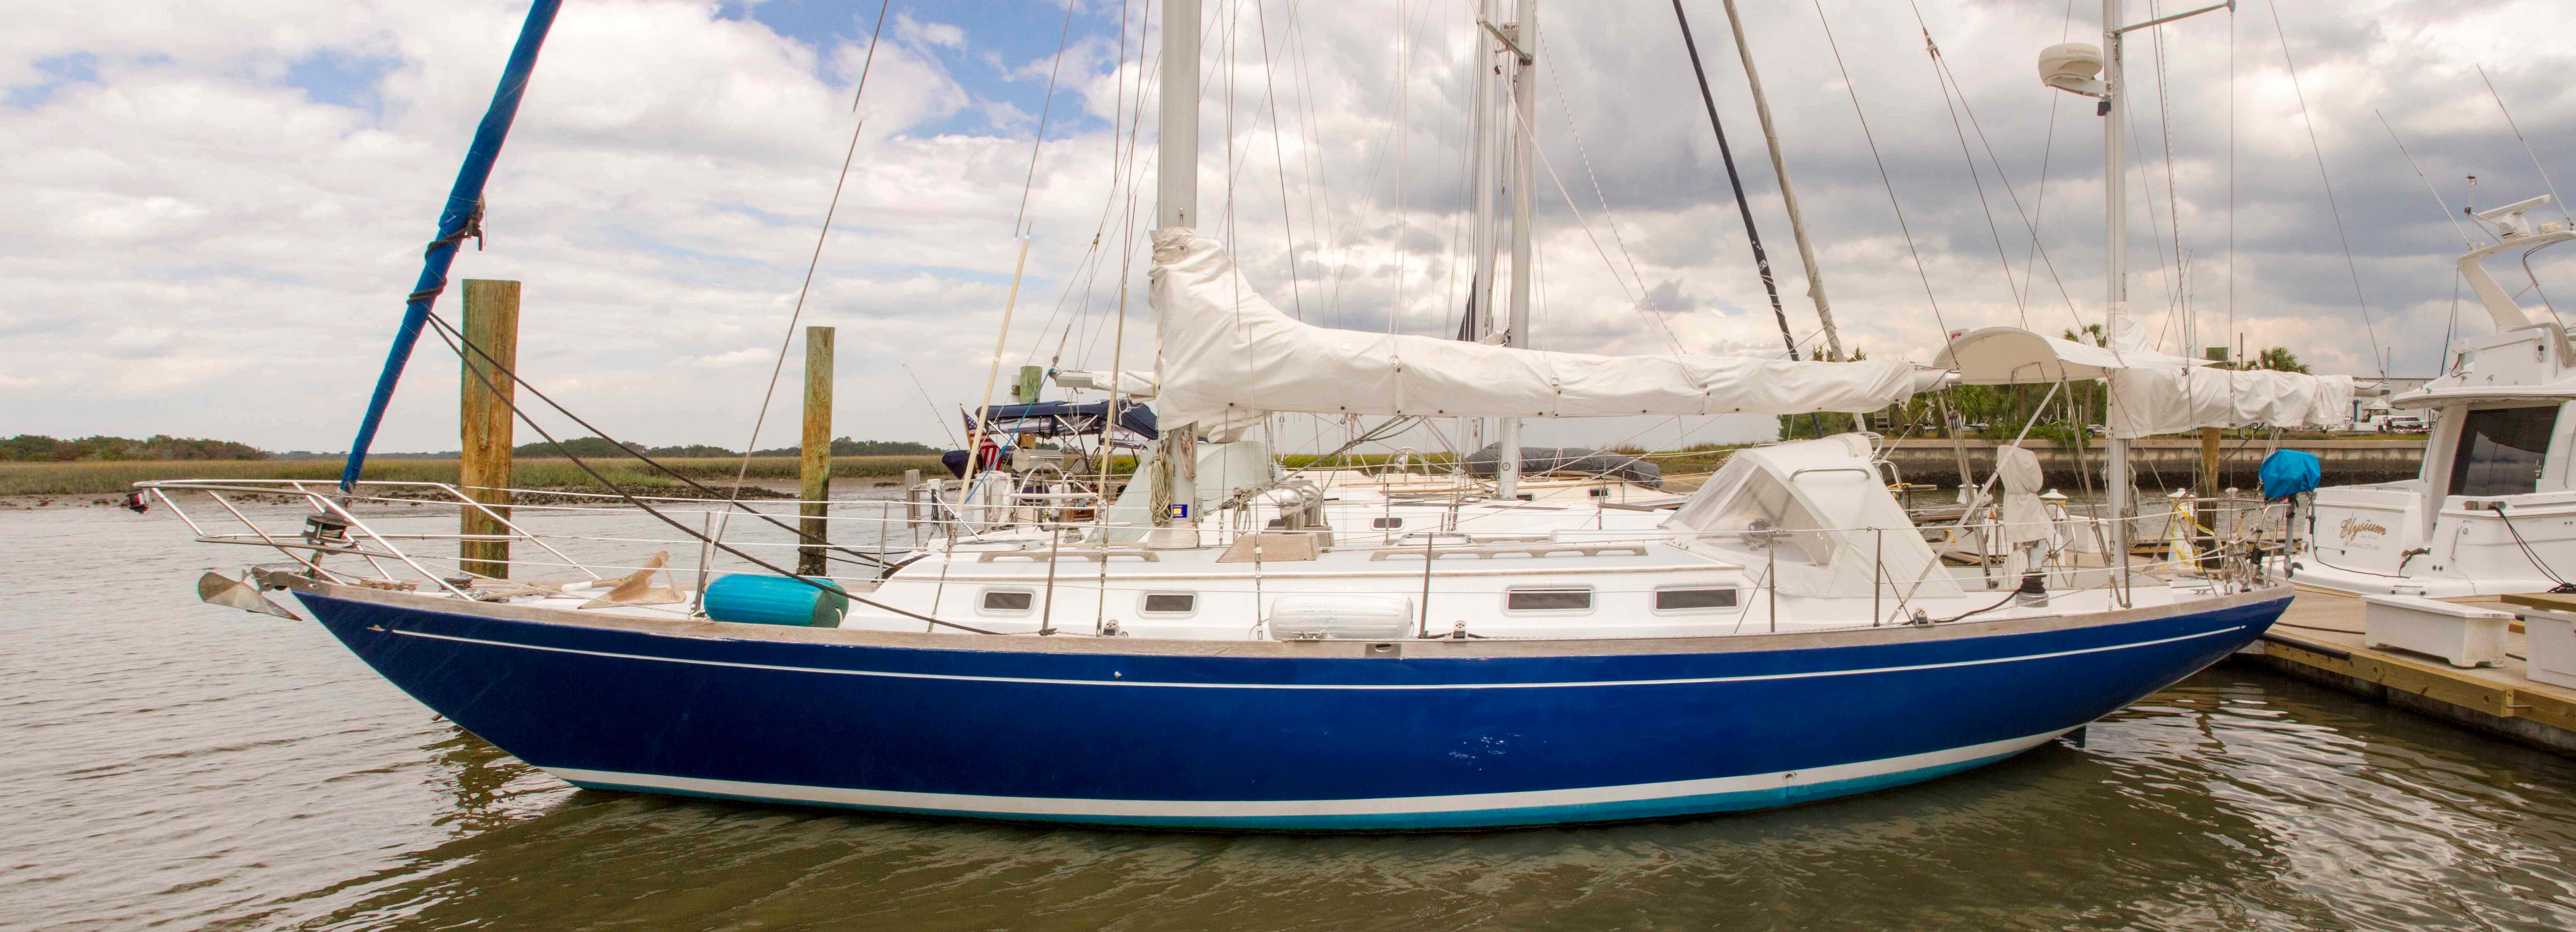 40' Migrator Yachts 1987 Tripp Block Island 40 Yawl